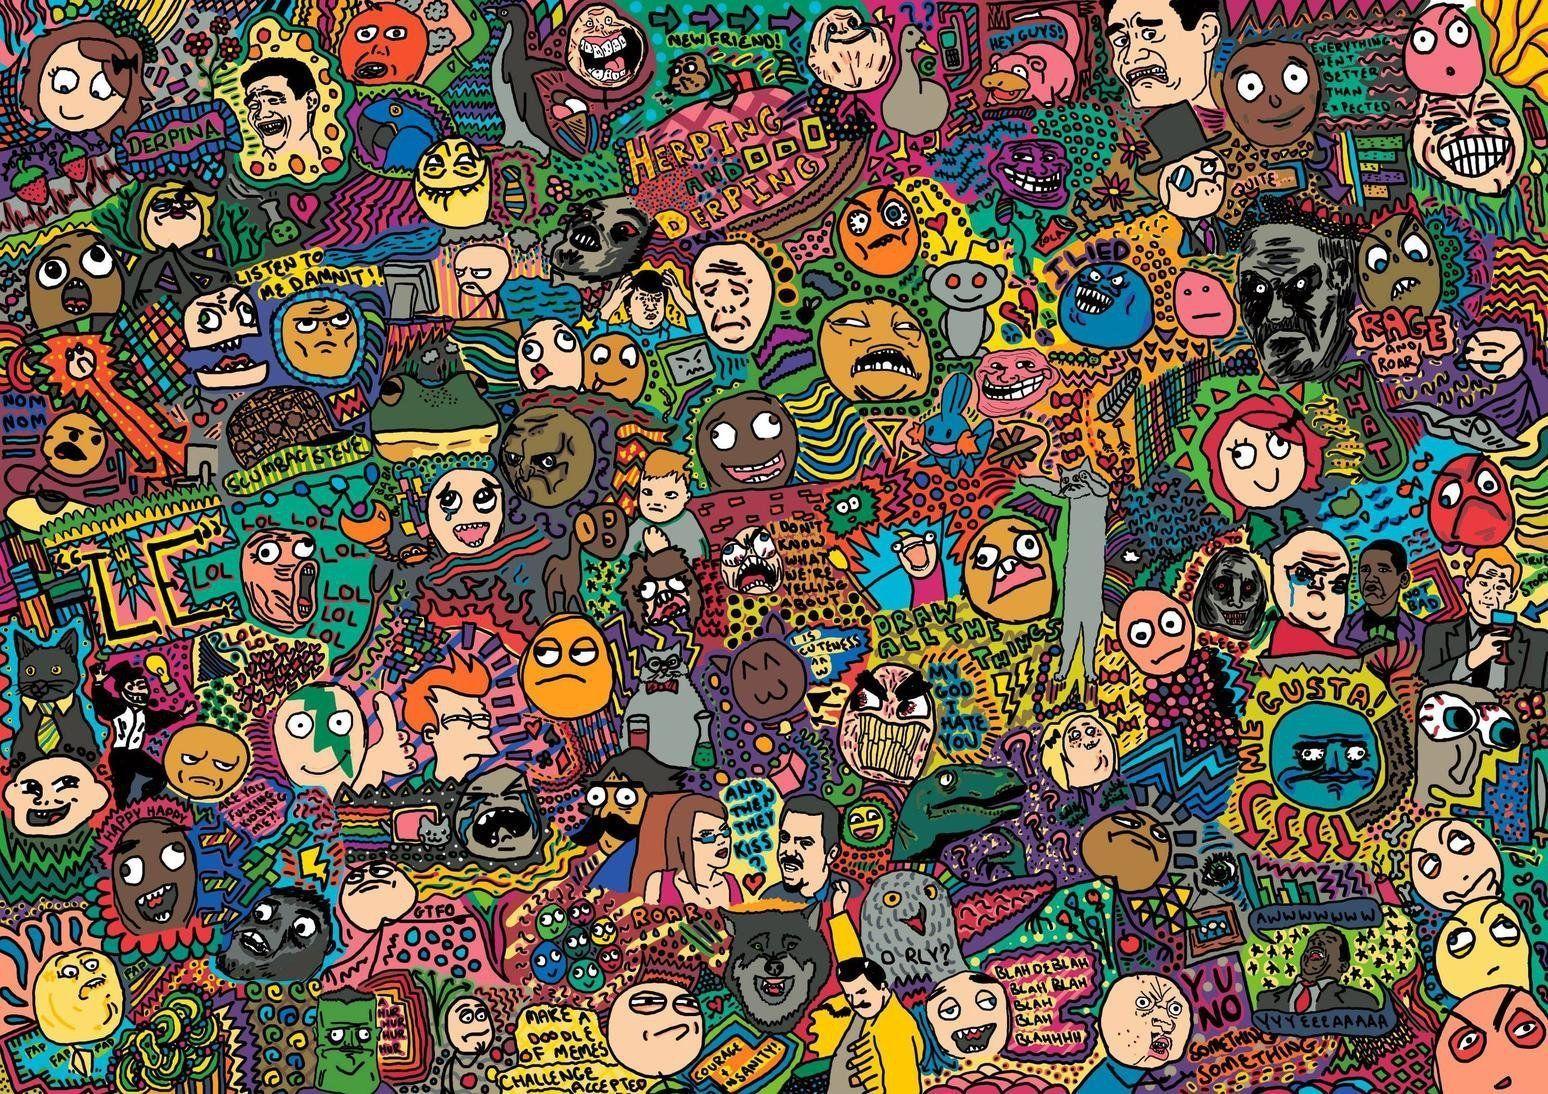 Meme Wallpaper 2020 Laptop Funny P Funny Wallpapers Colorful Wallpaper